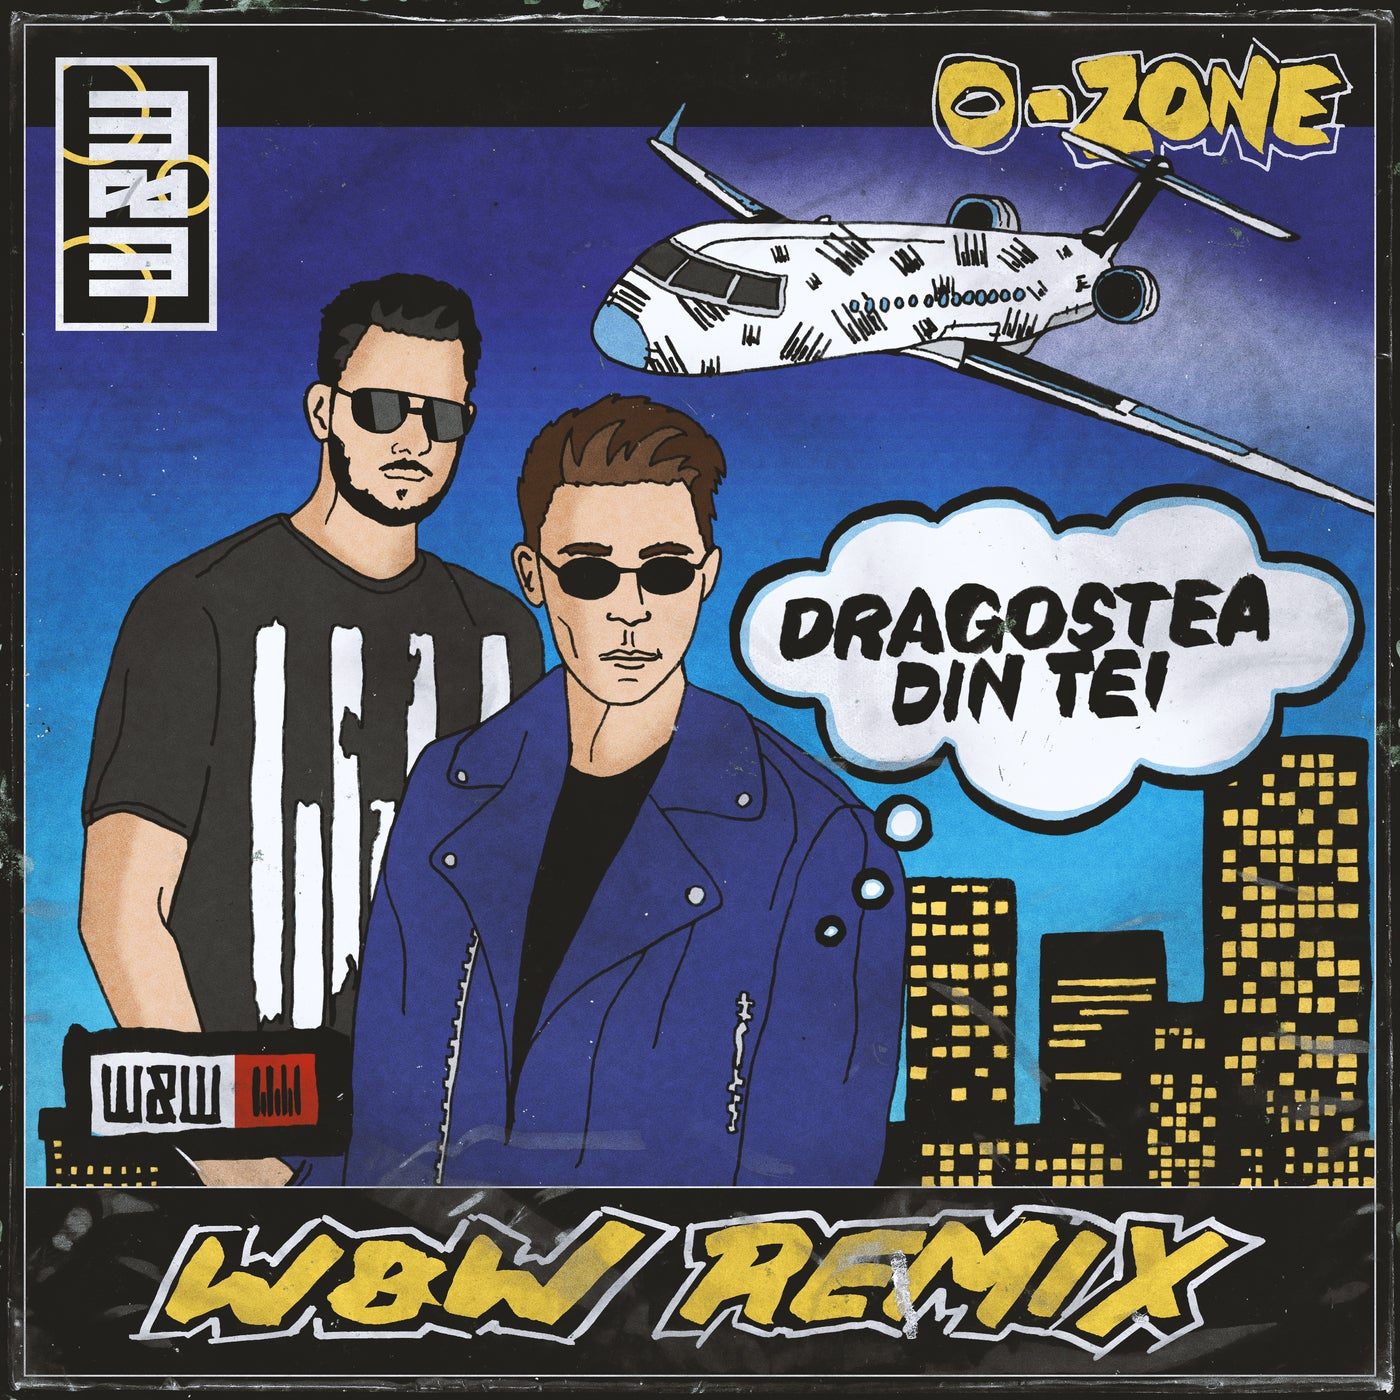 Dragostea Din Tei (W&W Remix) (Extended Mix)